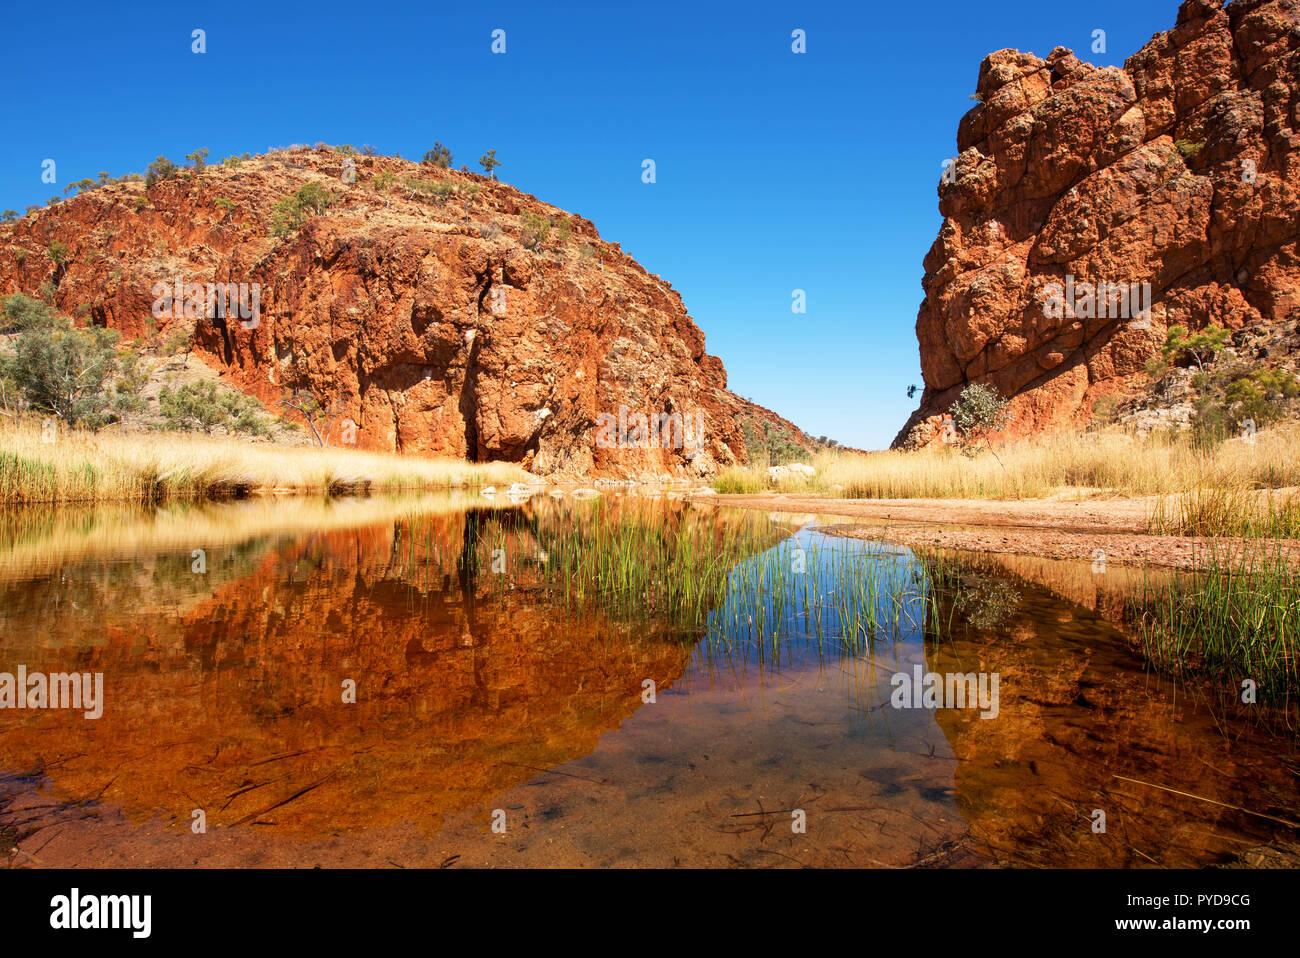 Glen Helen Gorge, MacDonnell Ranges, Northern Territory, Australia - Stock Image